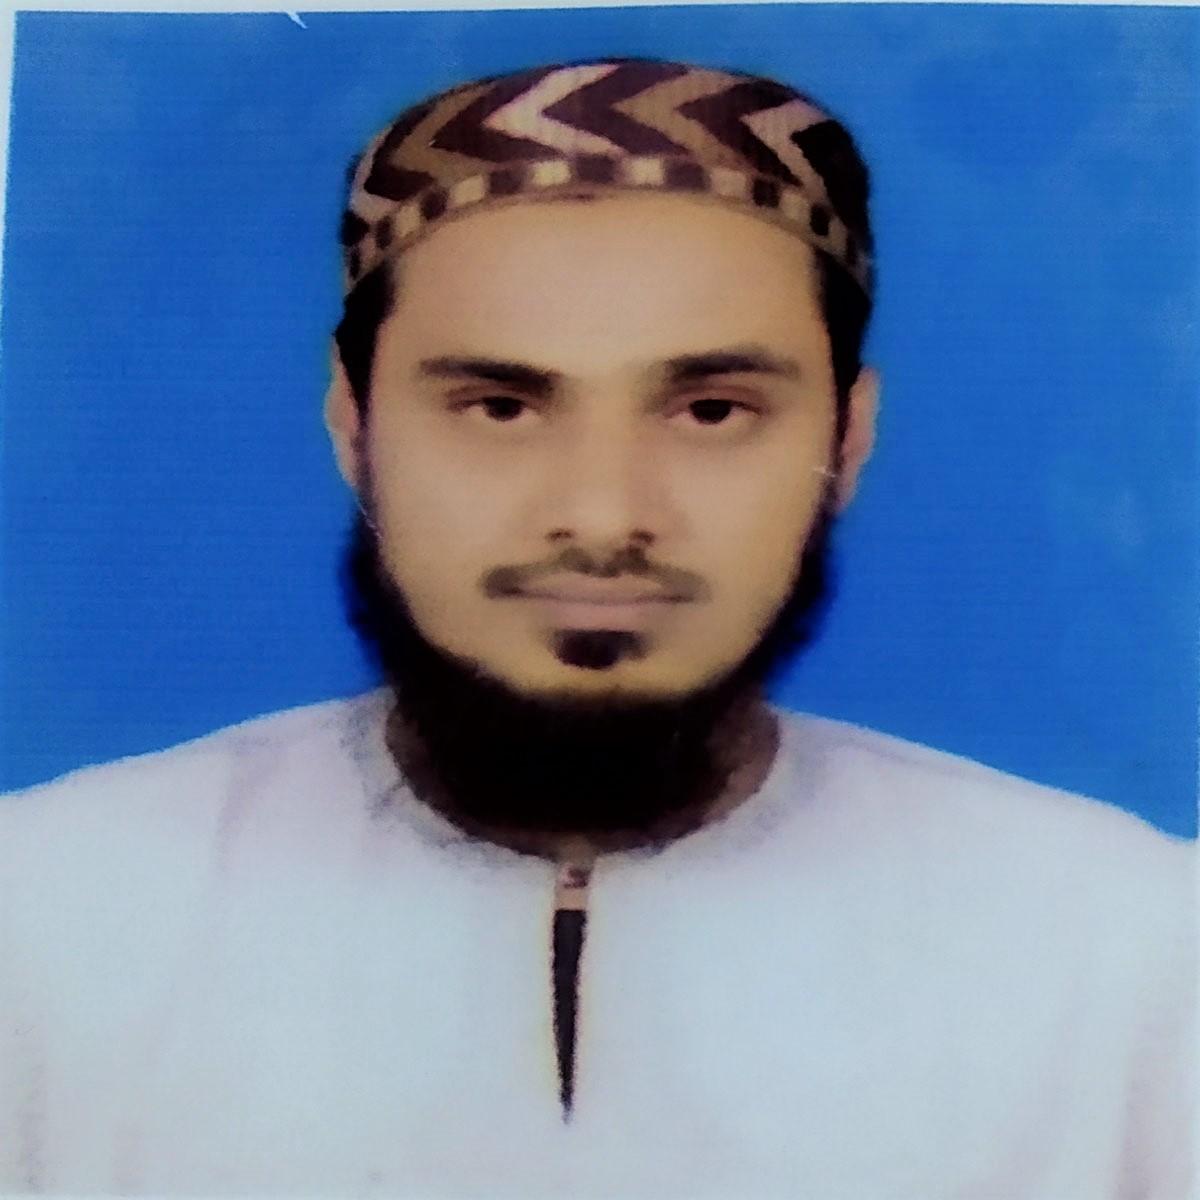 Abdullah-Al-jami-(DUXD,FDI)